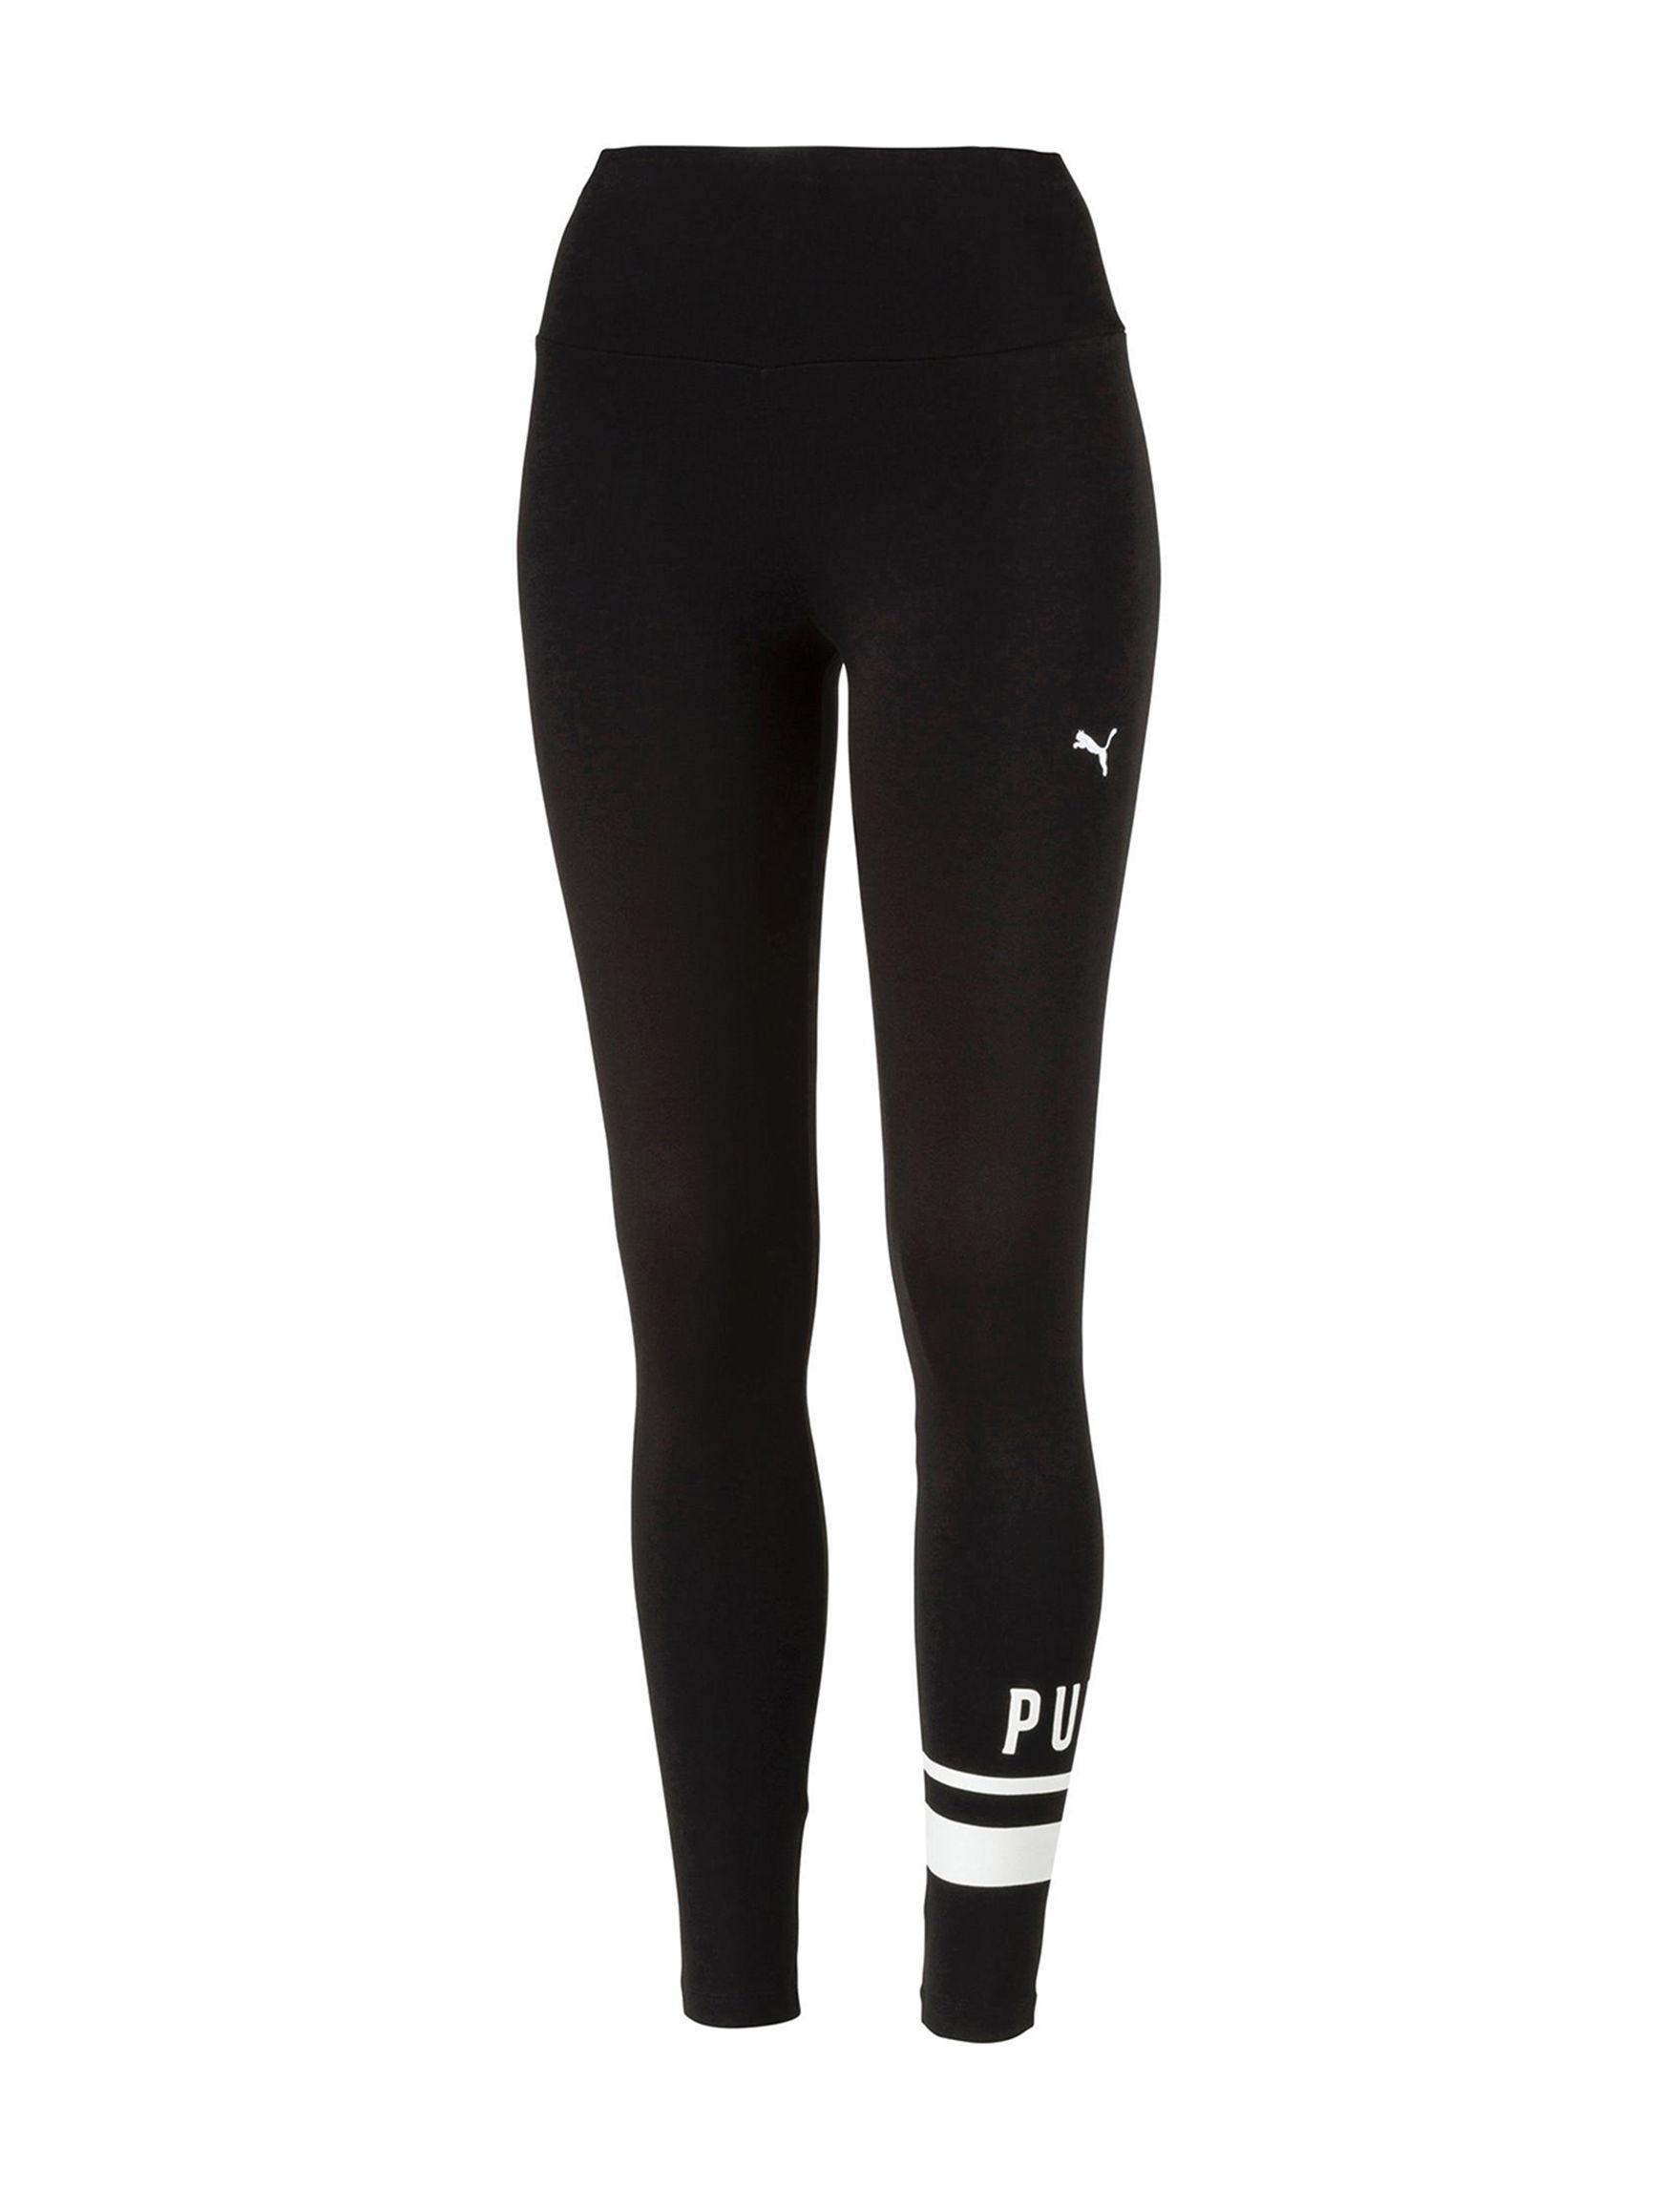 Puma Black /  White Leggings